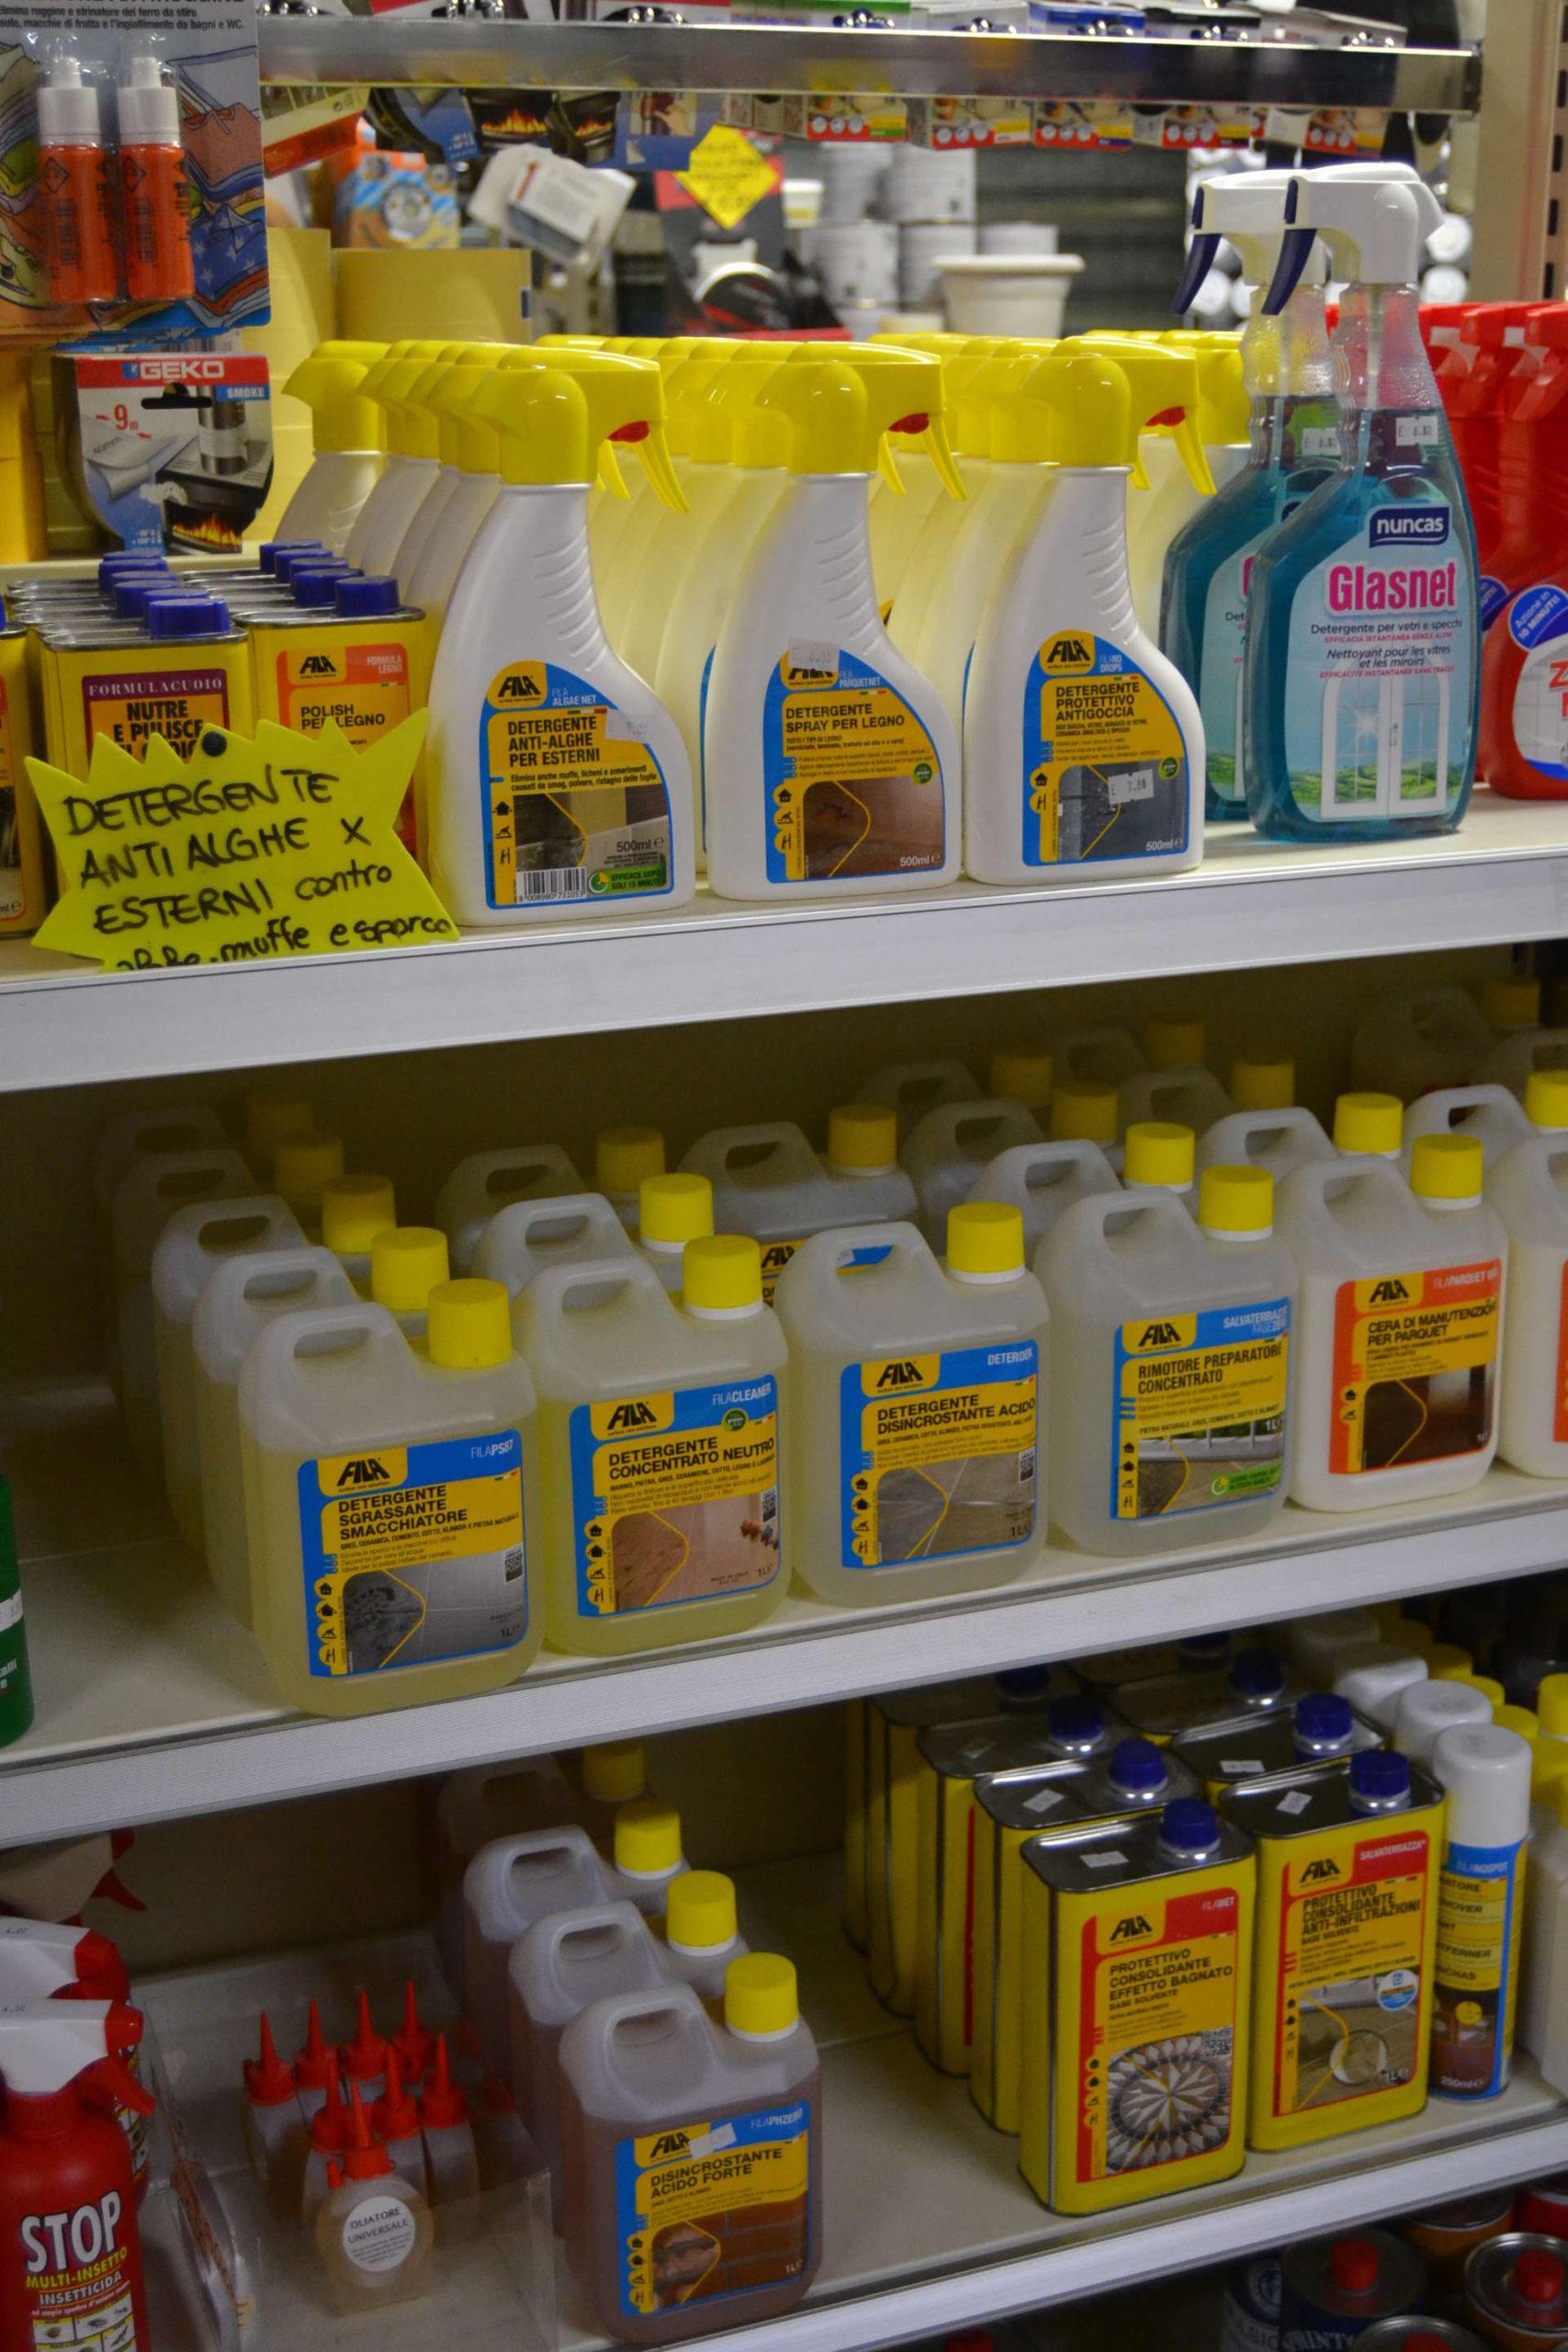 Detergenti e Protettivi di Qualità scaled